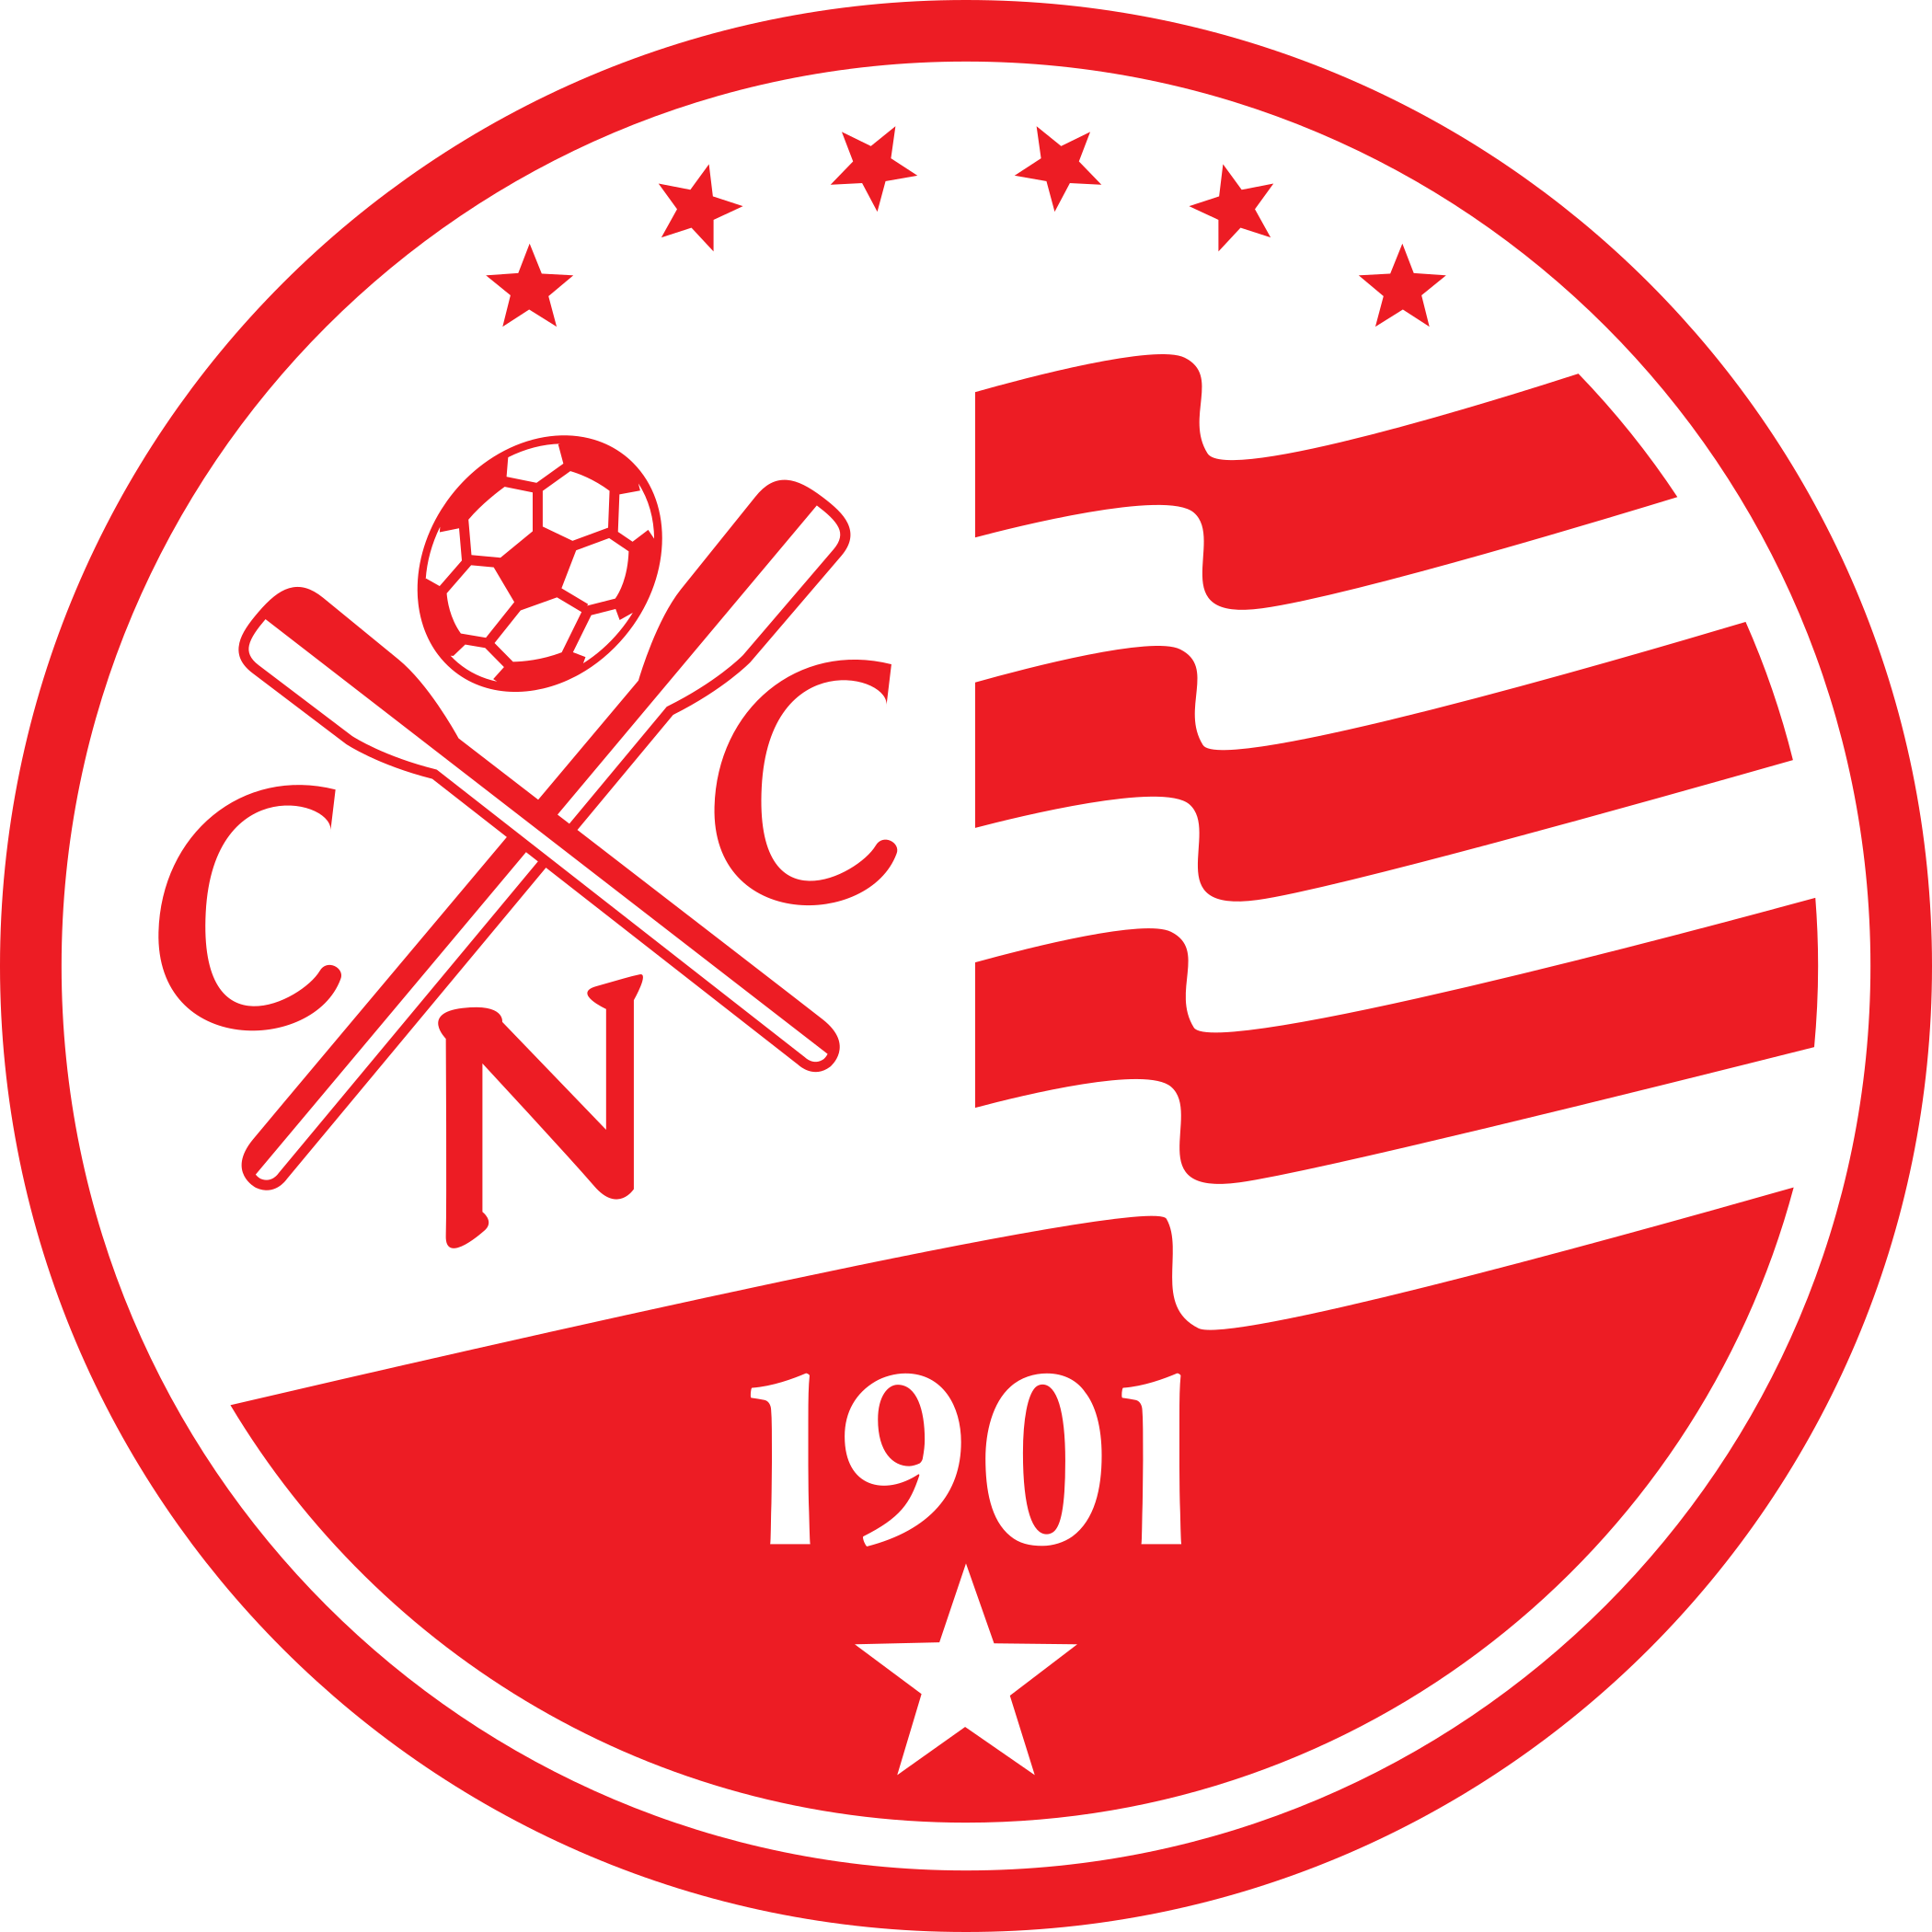 nautico logo escudo 1 - Náutico Logo - Escudo - Clube Náutico Capibaribe Logo - Escudo